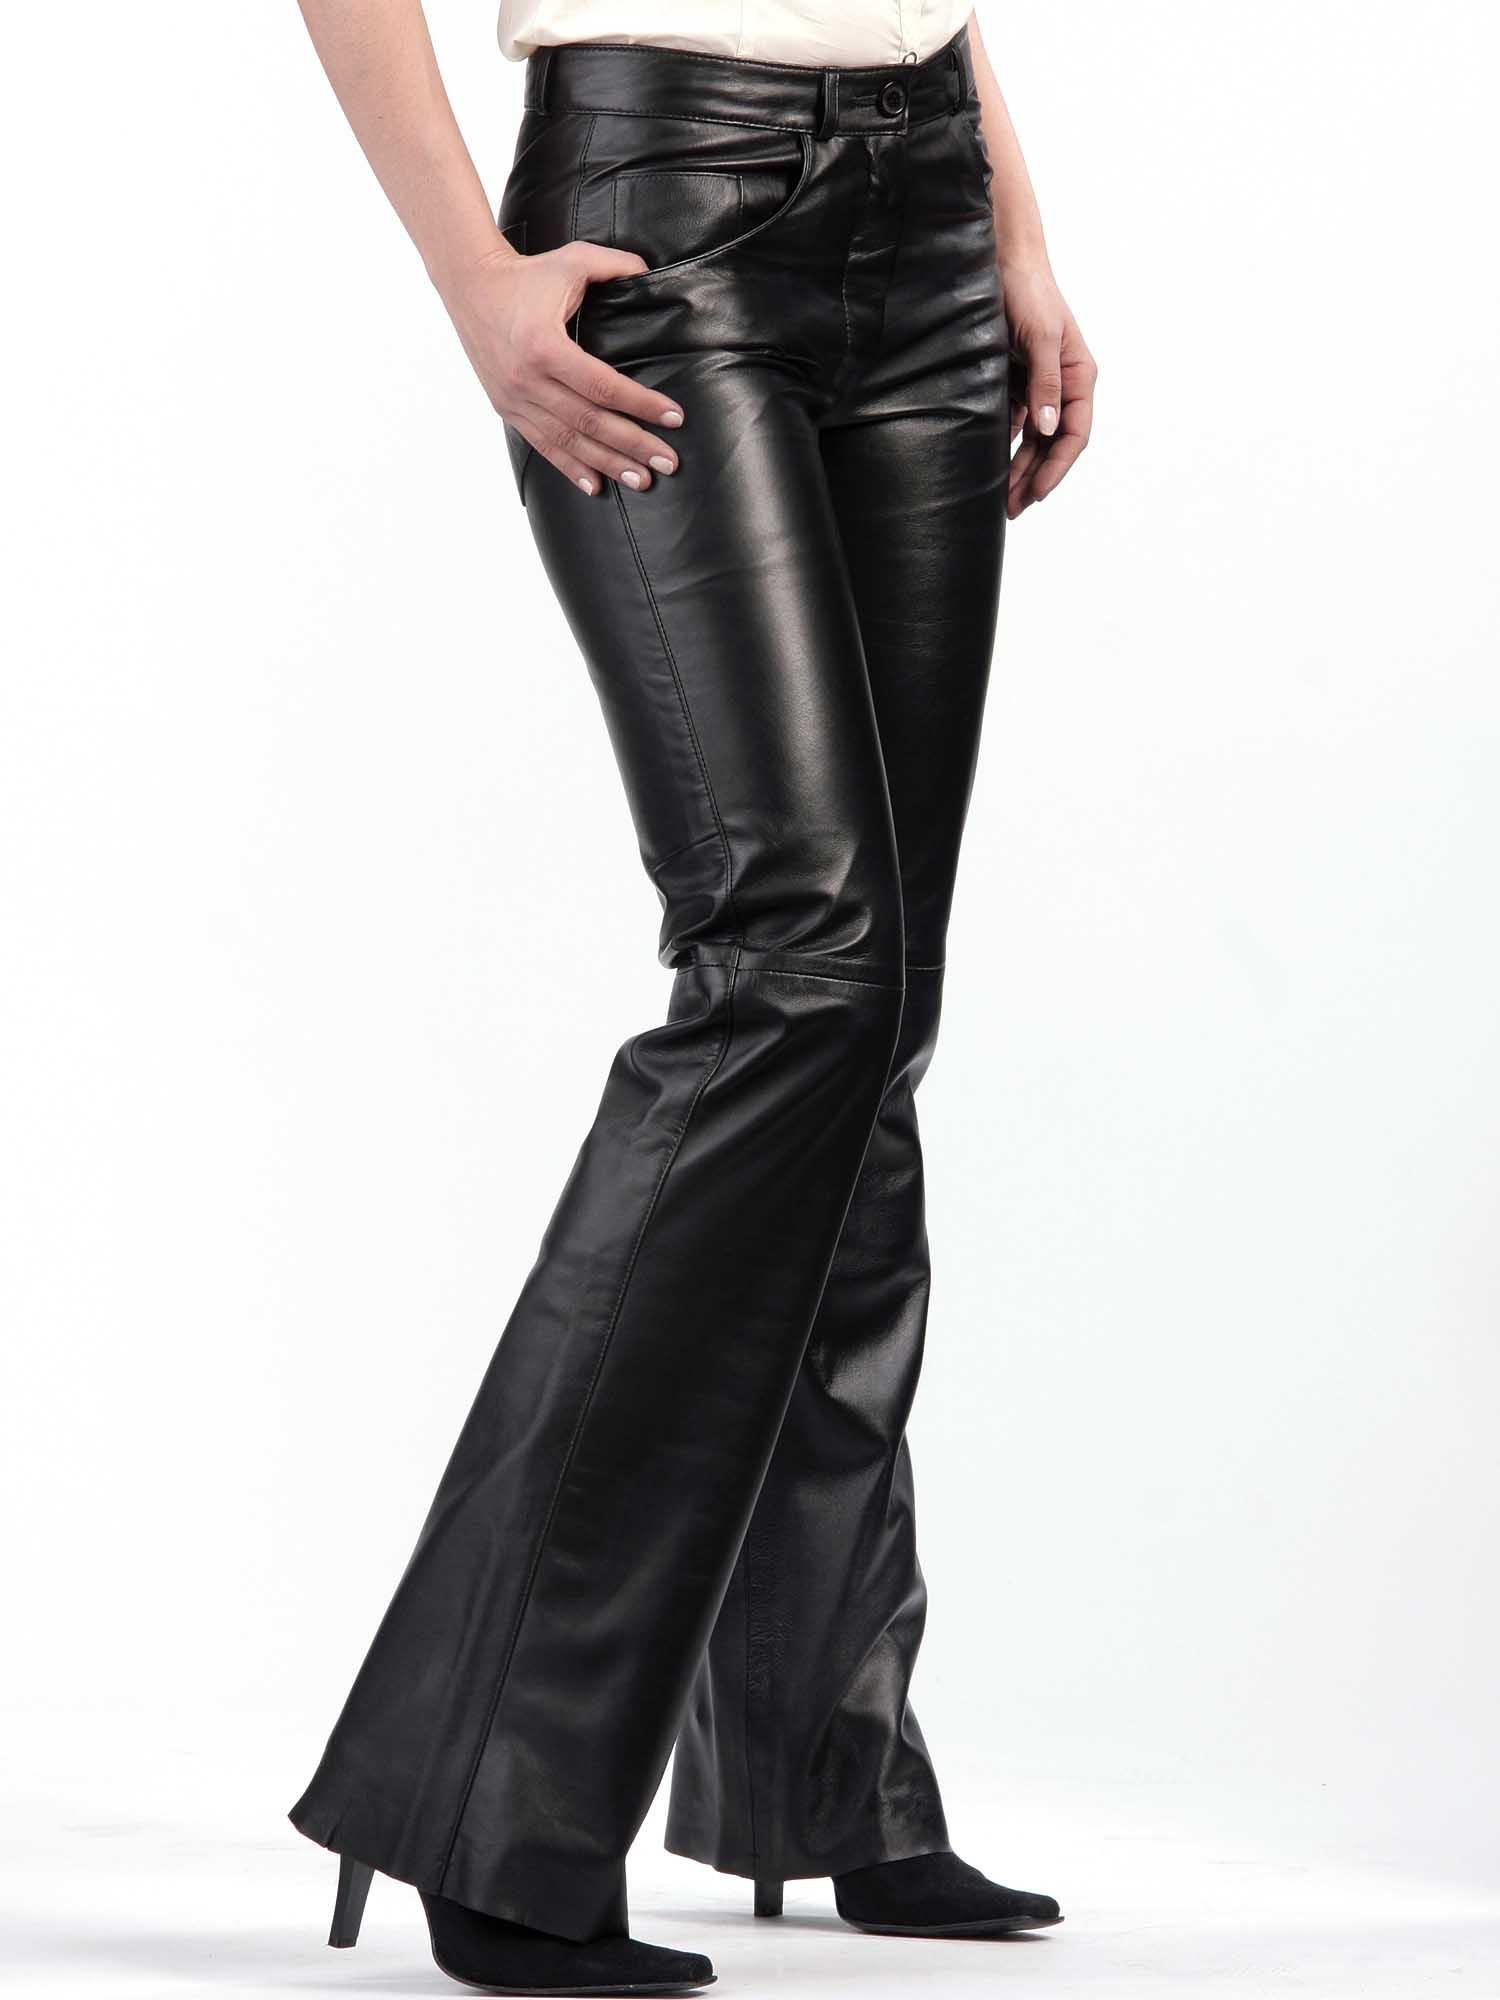 Original Leather Pants